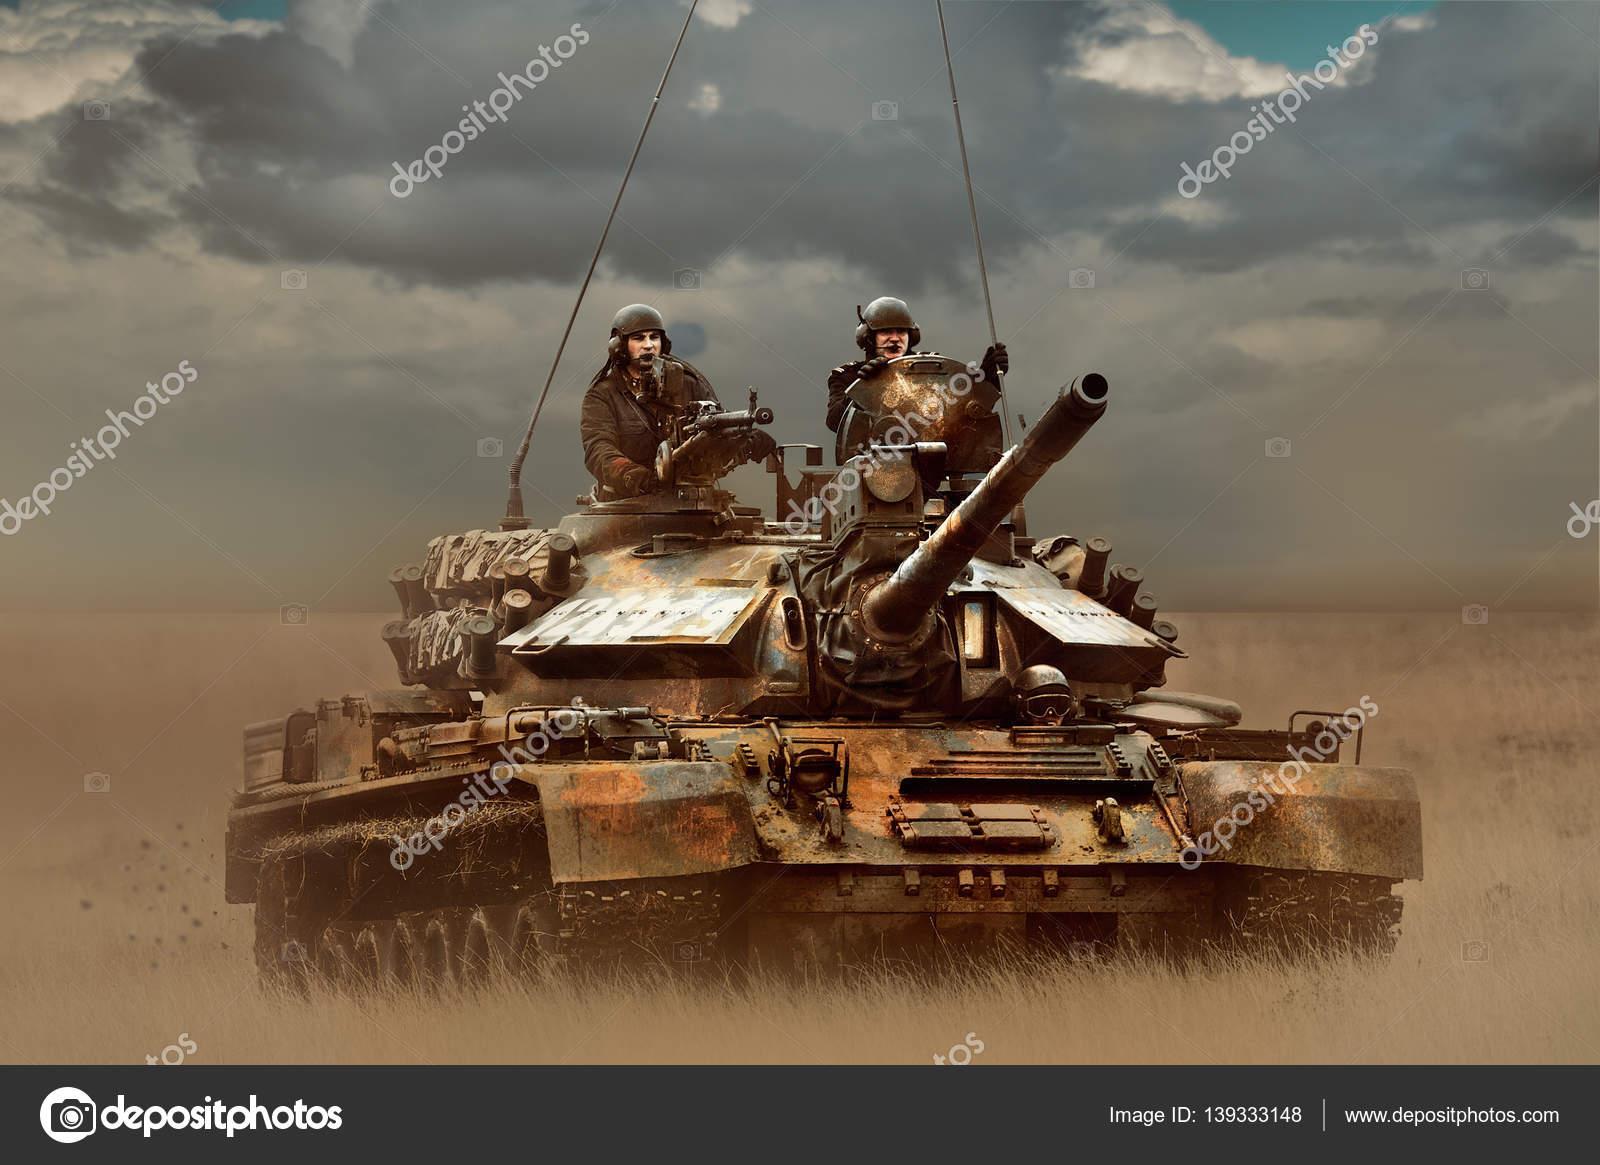 GALATI, ROMANIA - APRIL 22: Romanian tank TR-85M1 in military po